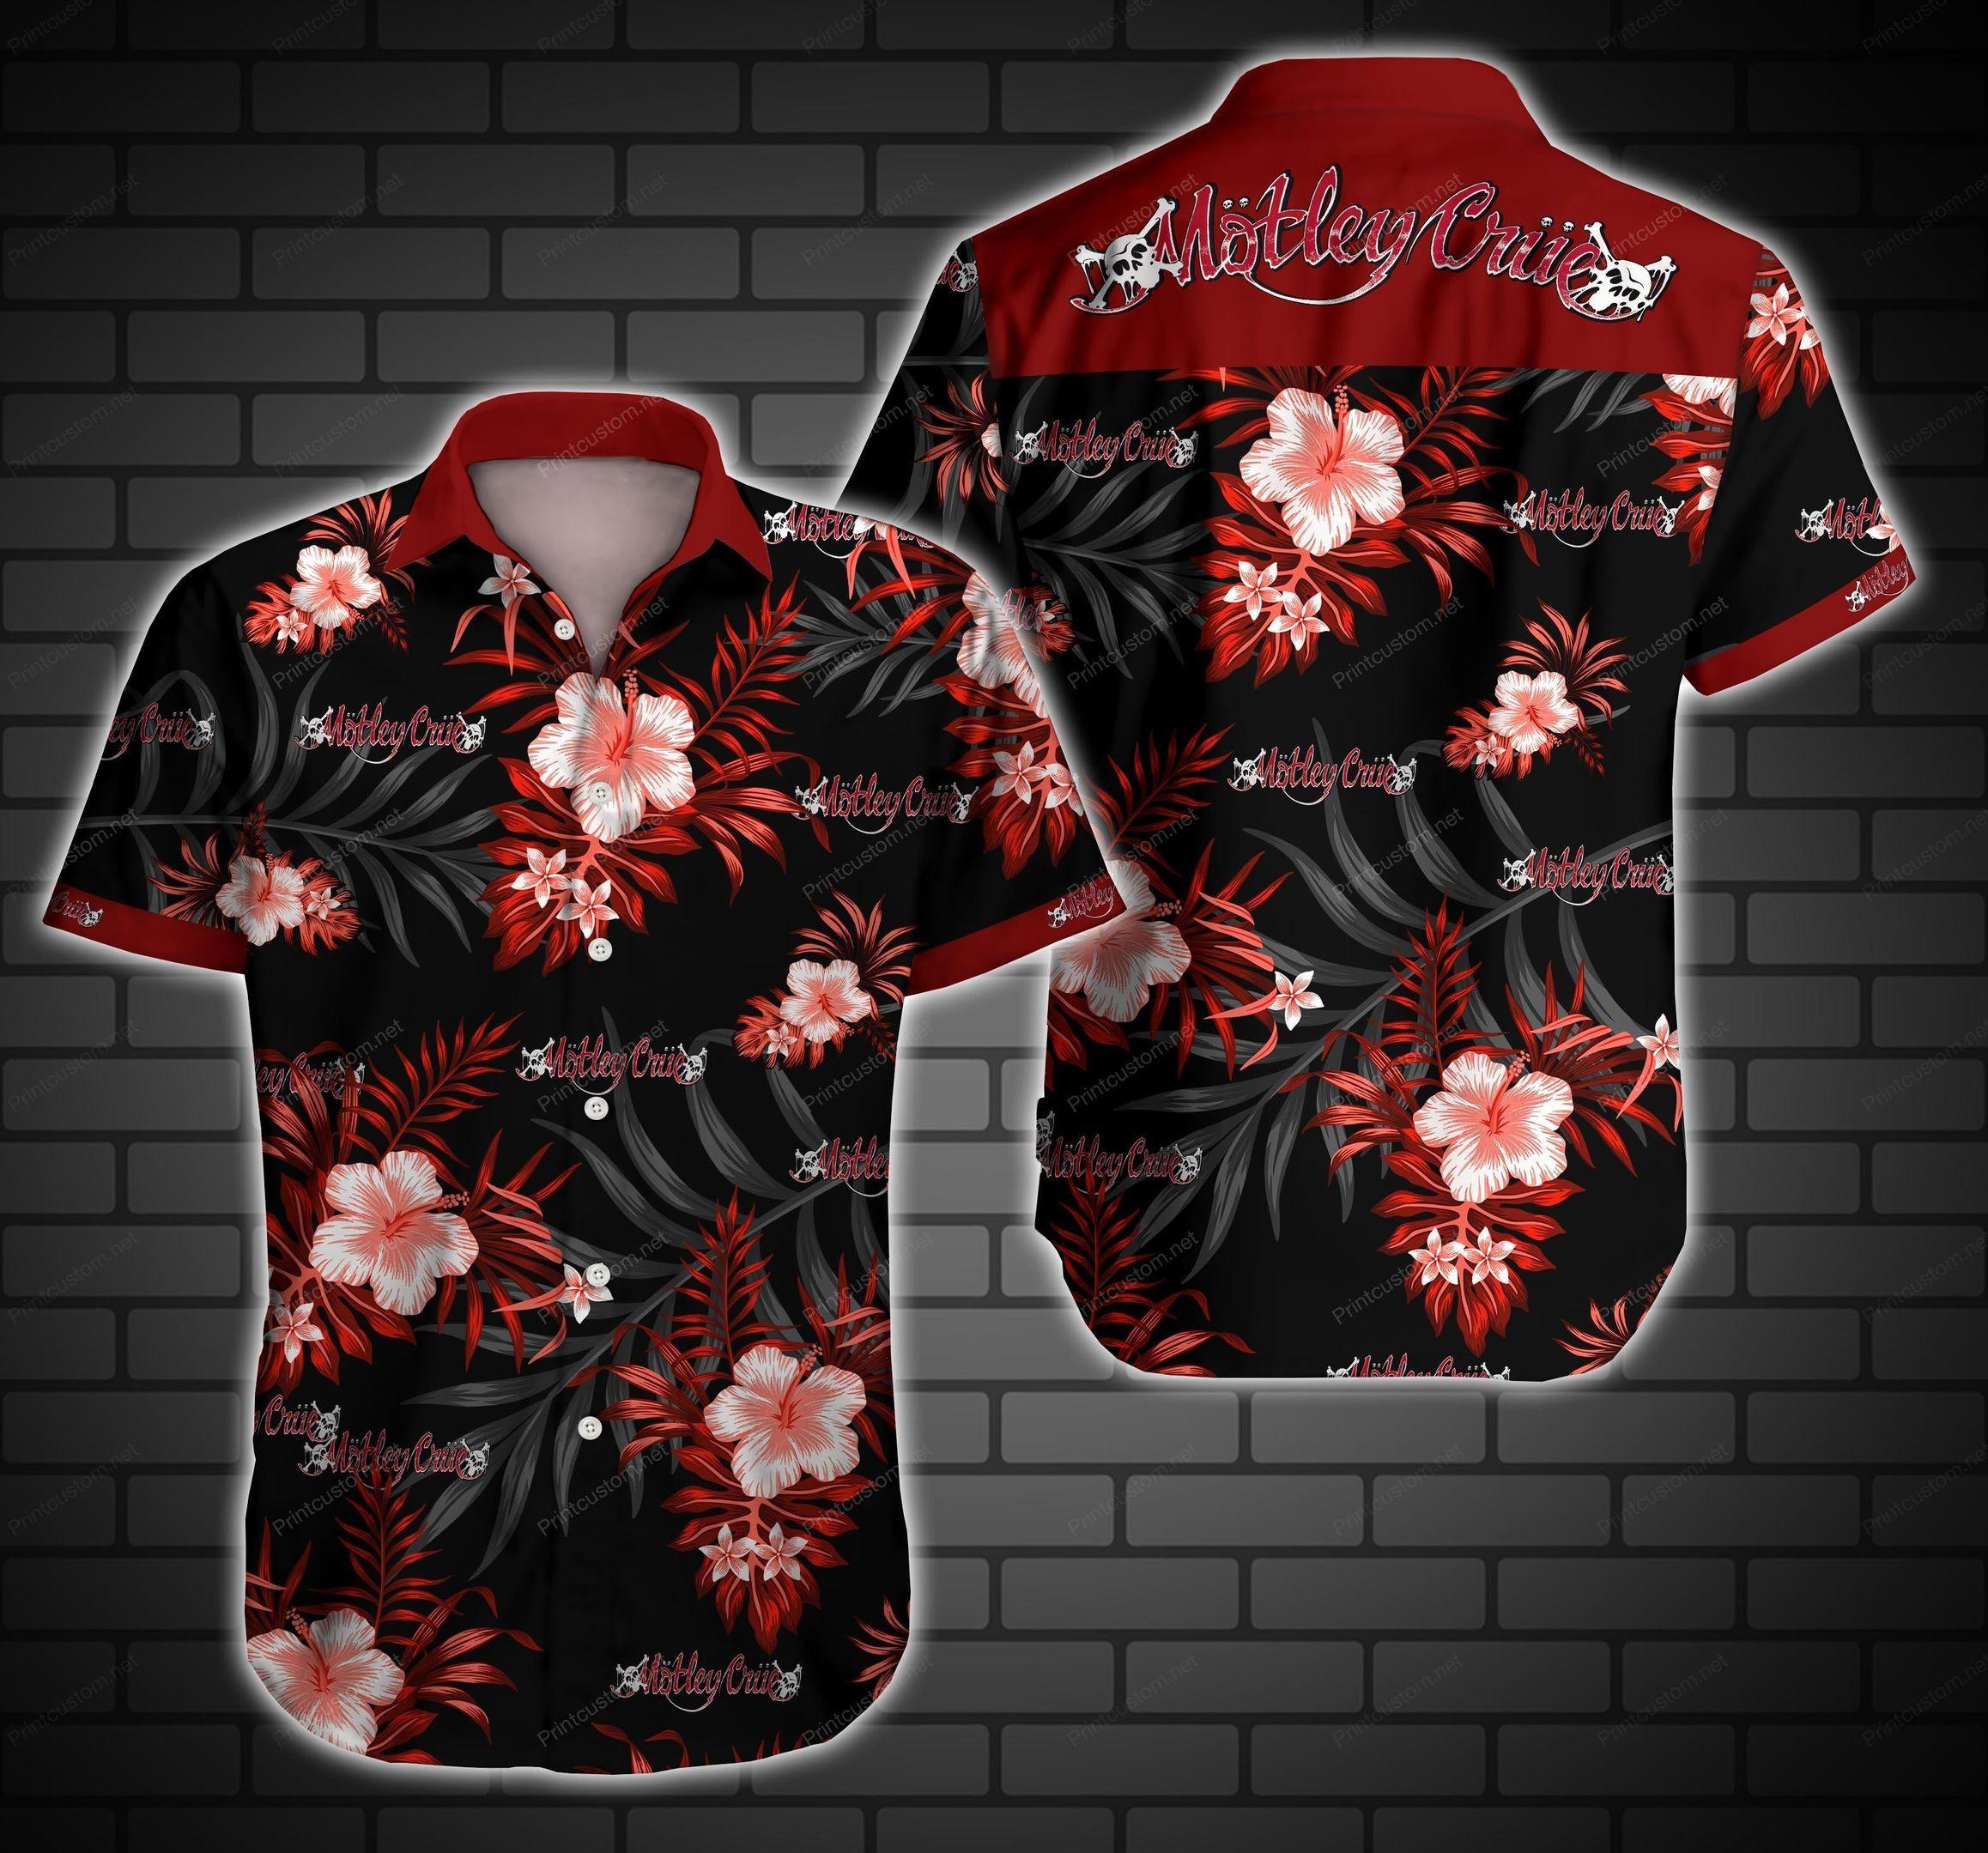 Motley Crue Floral Hawaiian Shirt Summer Beach Shirt